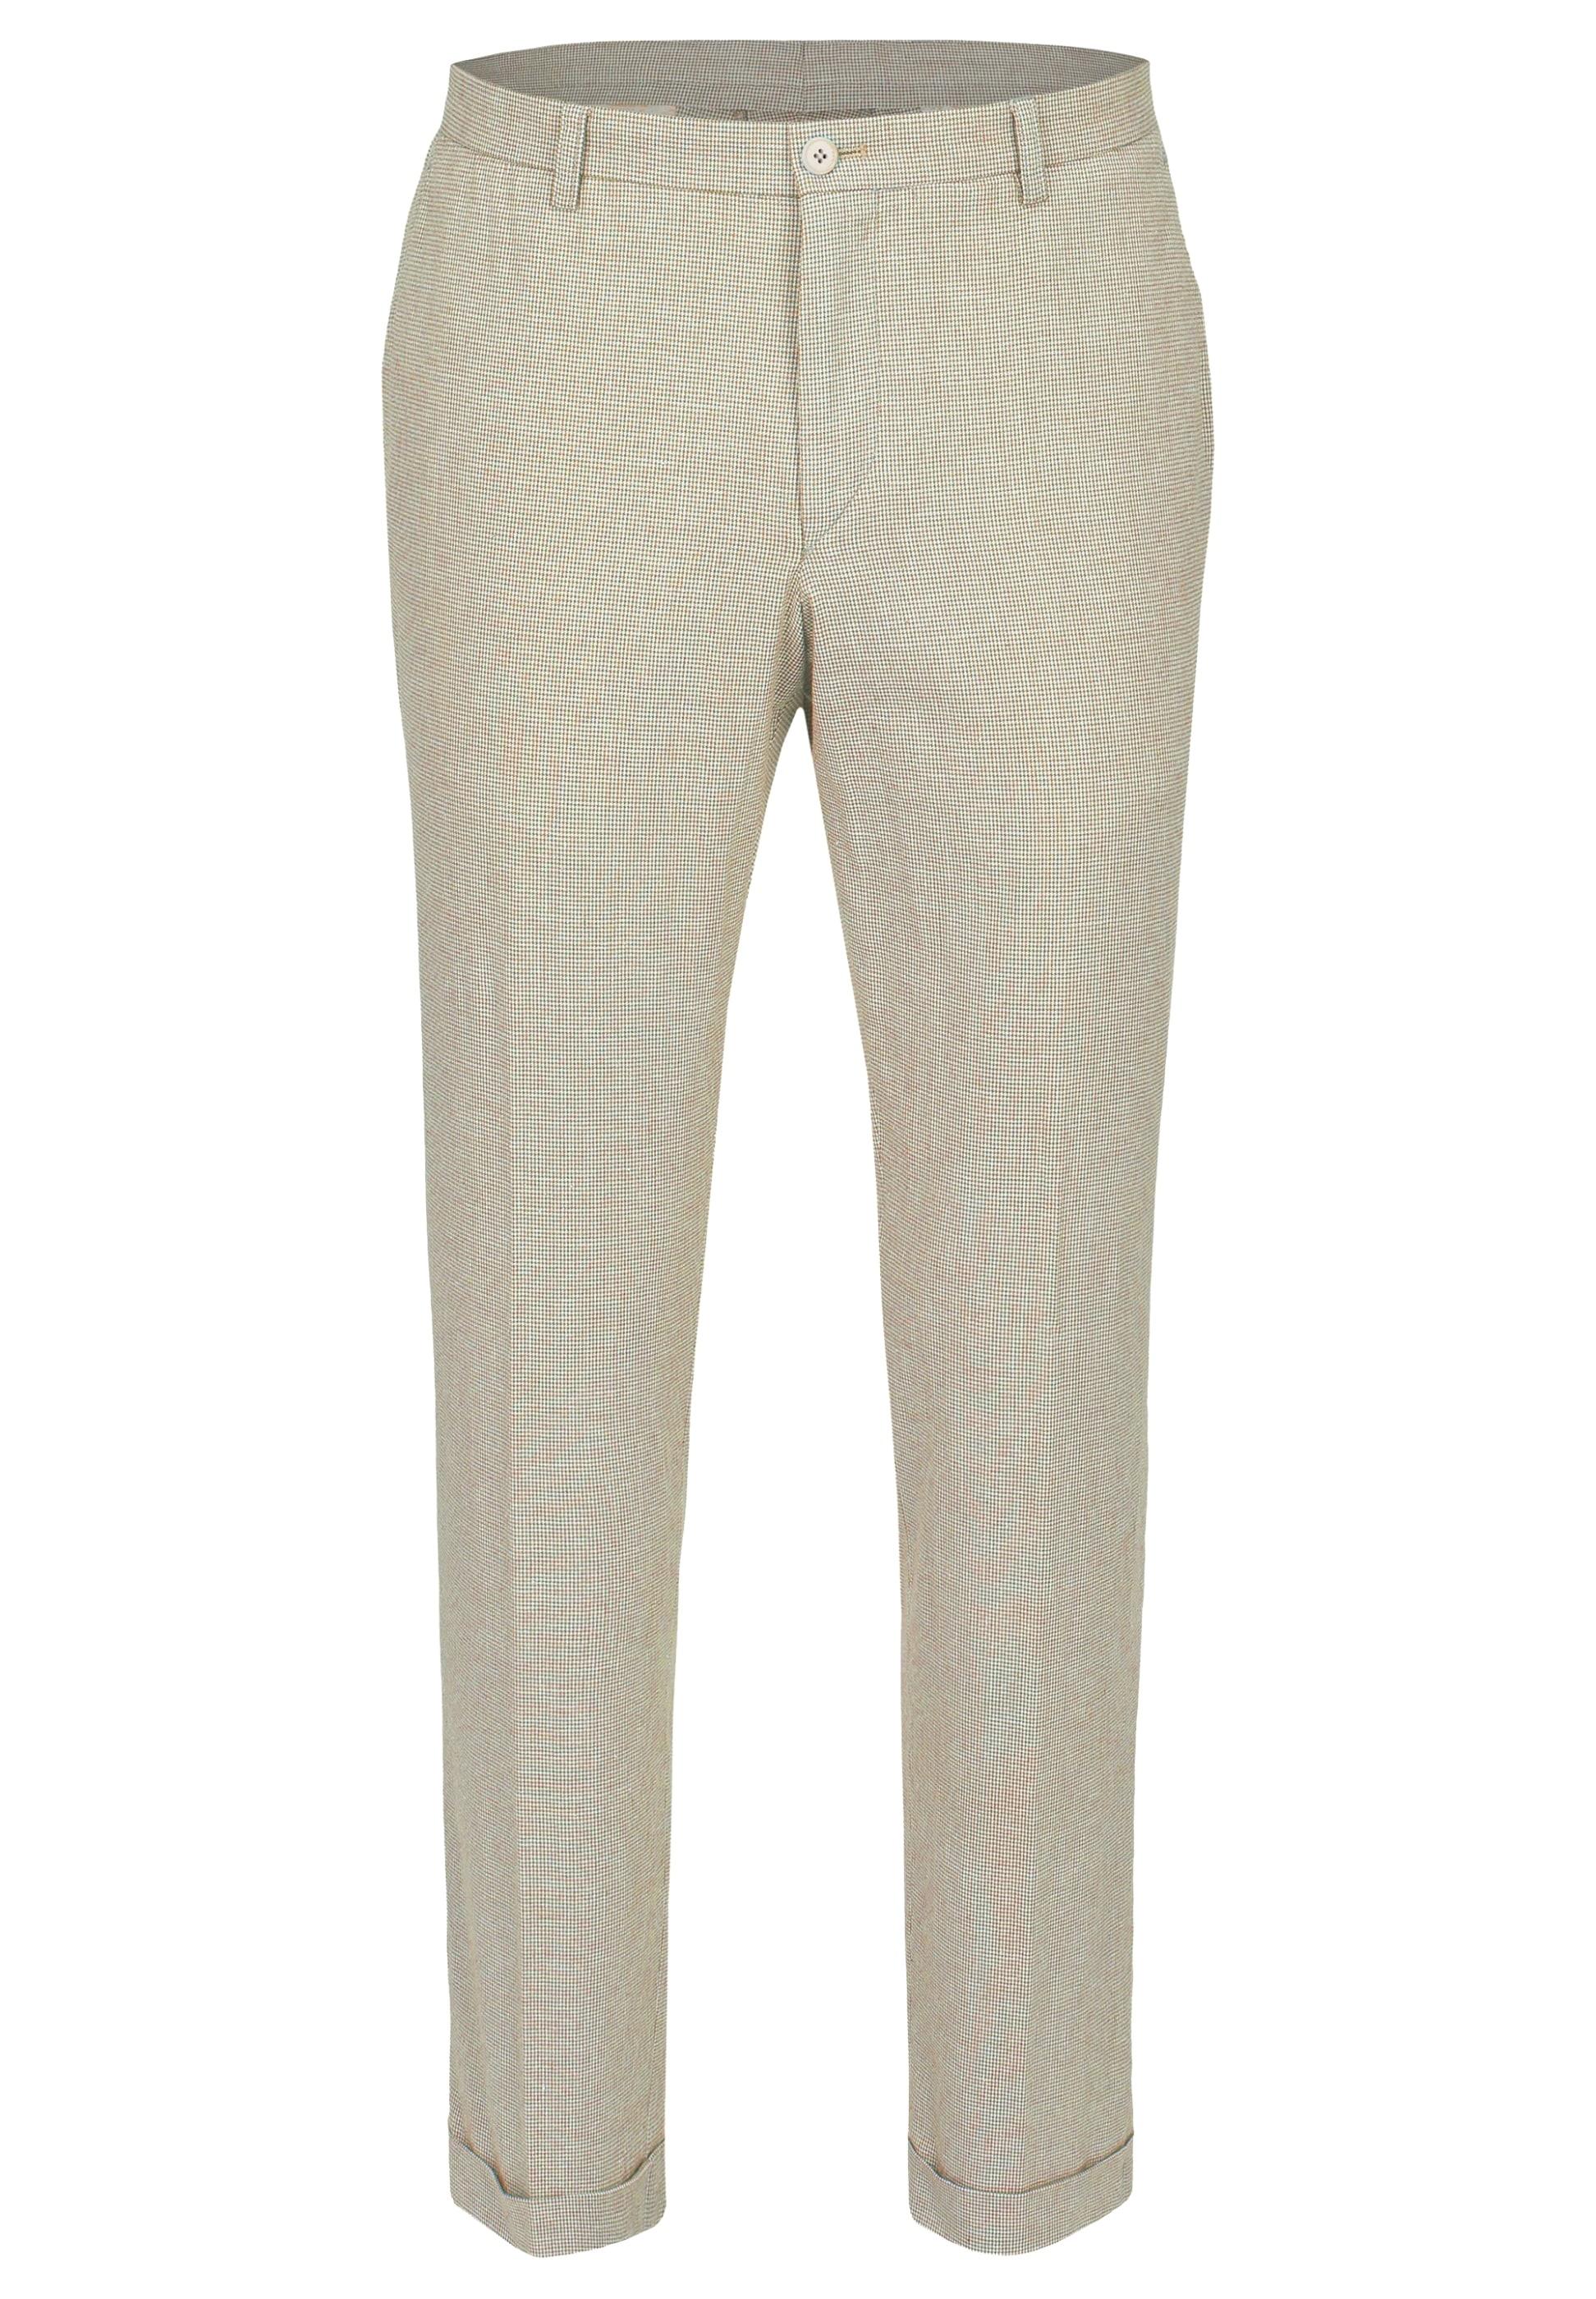 daniel hechter -  DH-ECO Anzug-Hose